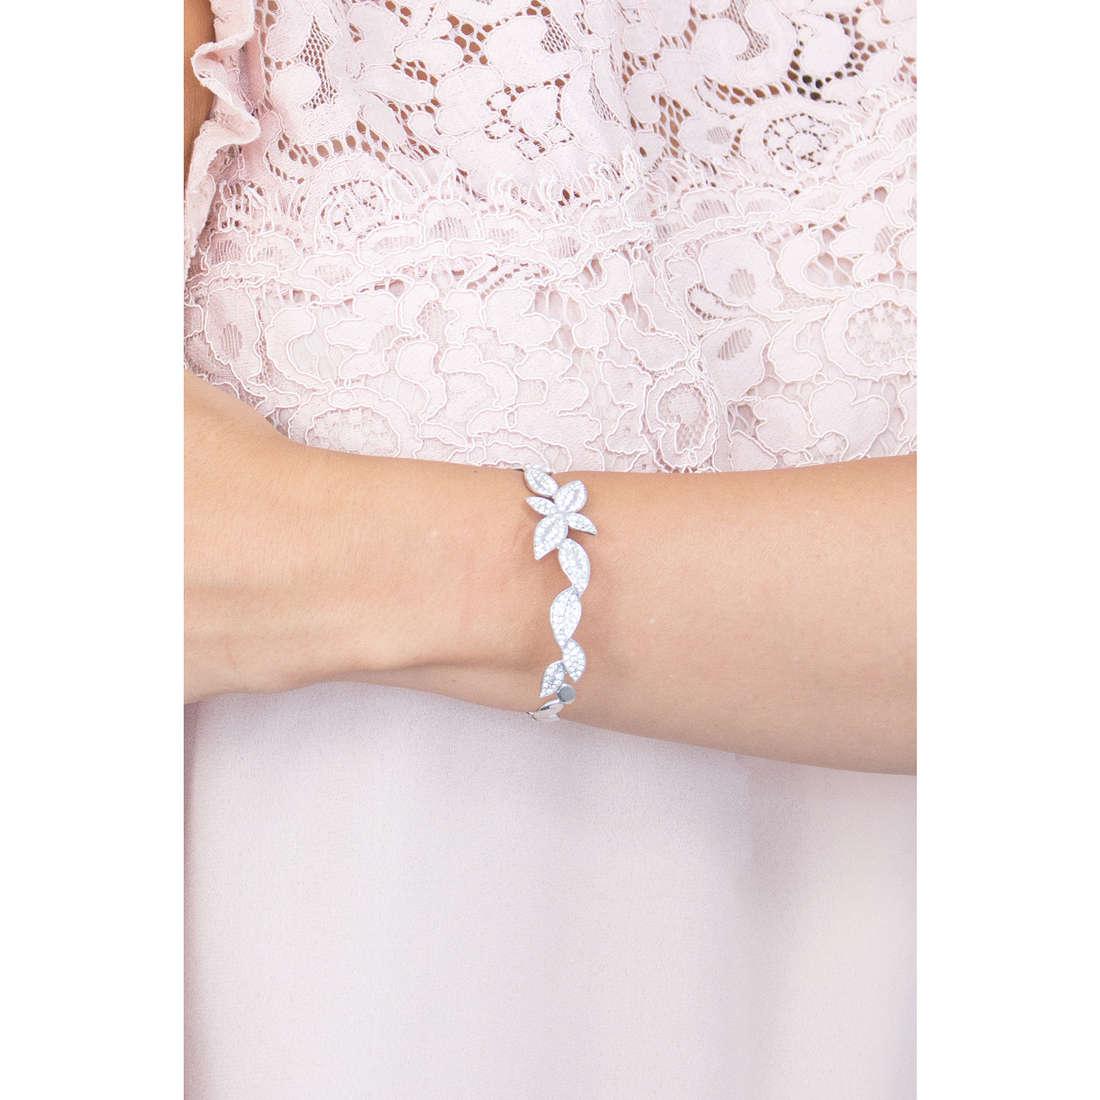 Morellato bracciali Natura donna SAHL16 indosso